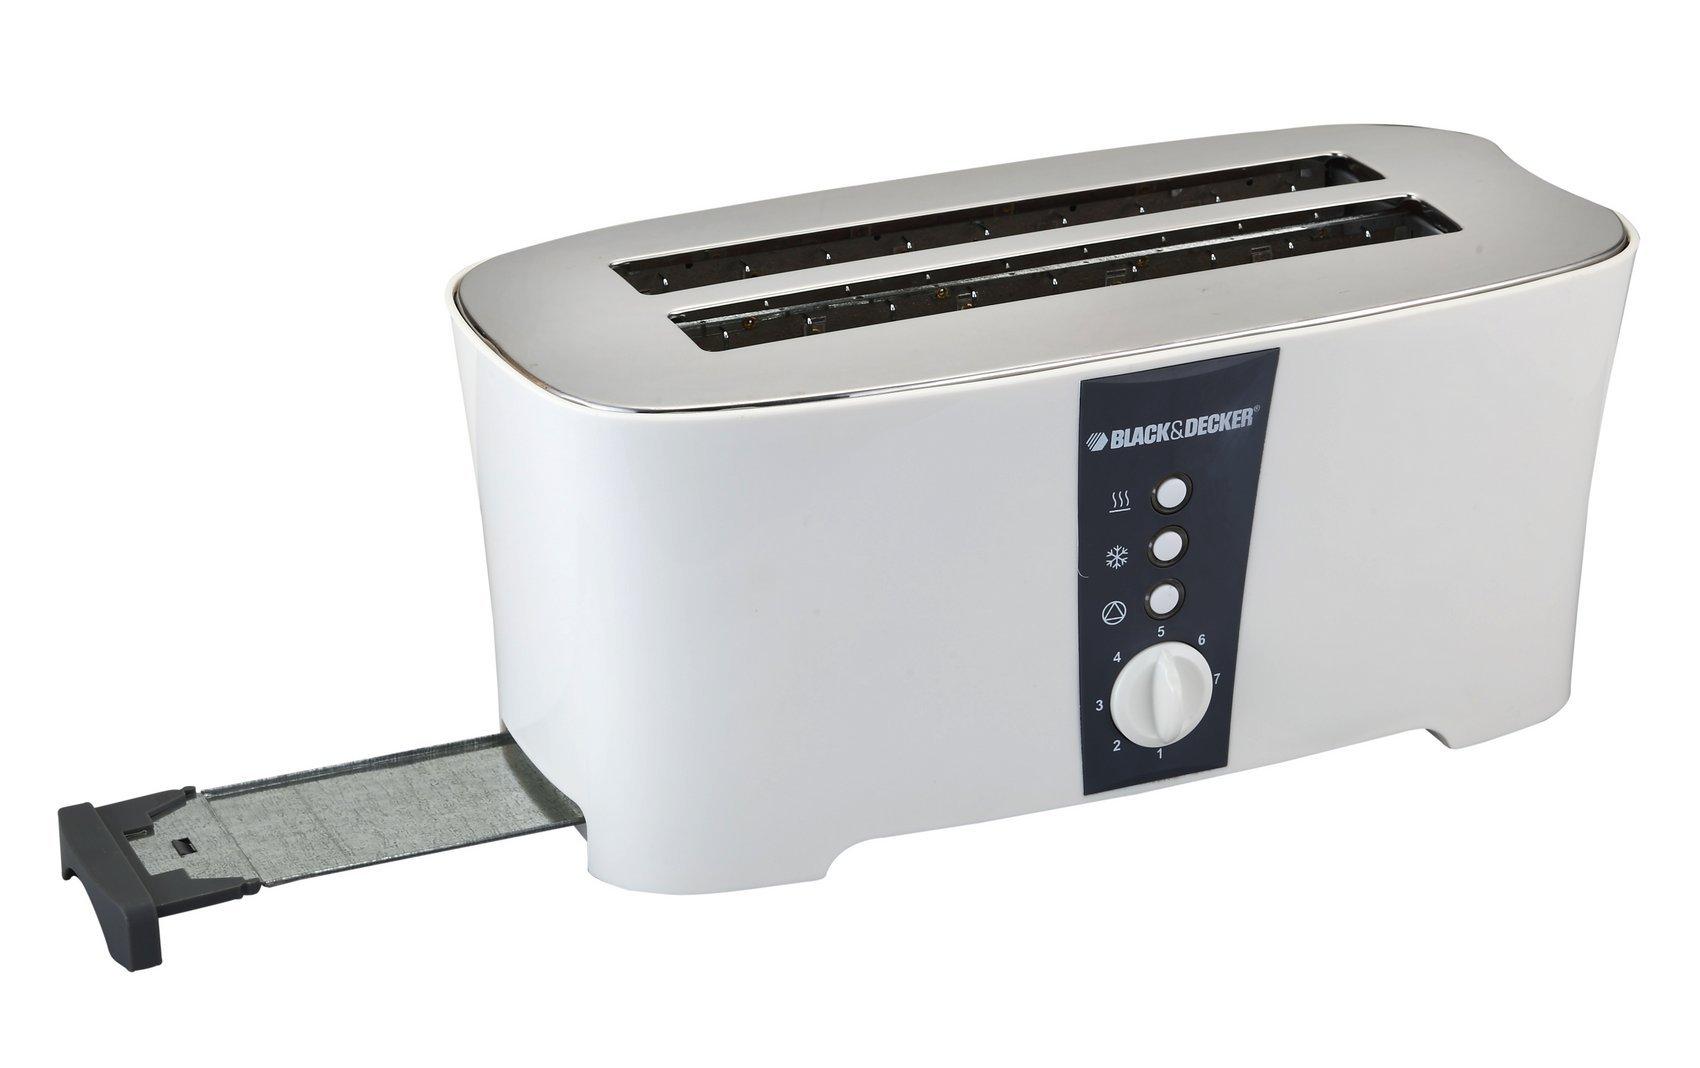 Black & Decker ET124 1350W 4-Slice Toaster (Non-USA Compliant), White by BLACK+DECKER (Image #4)